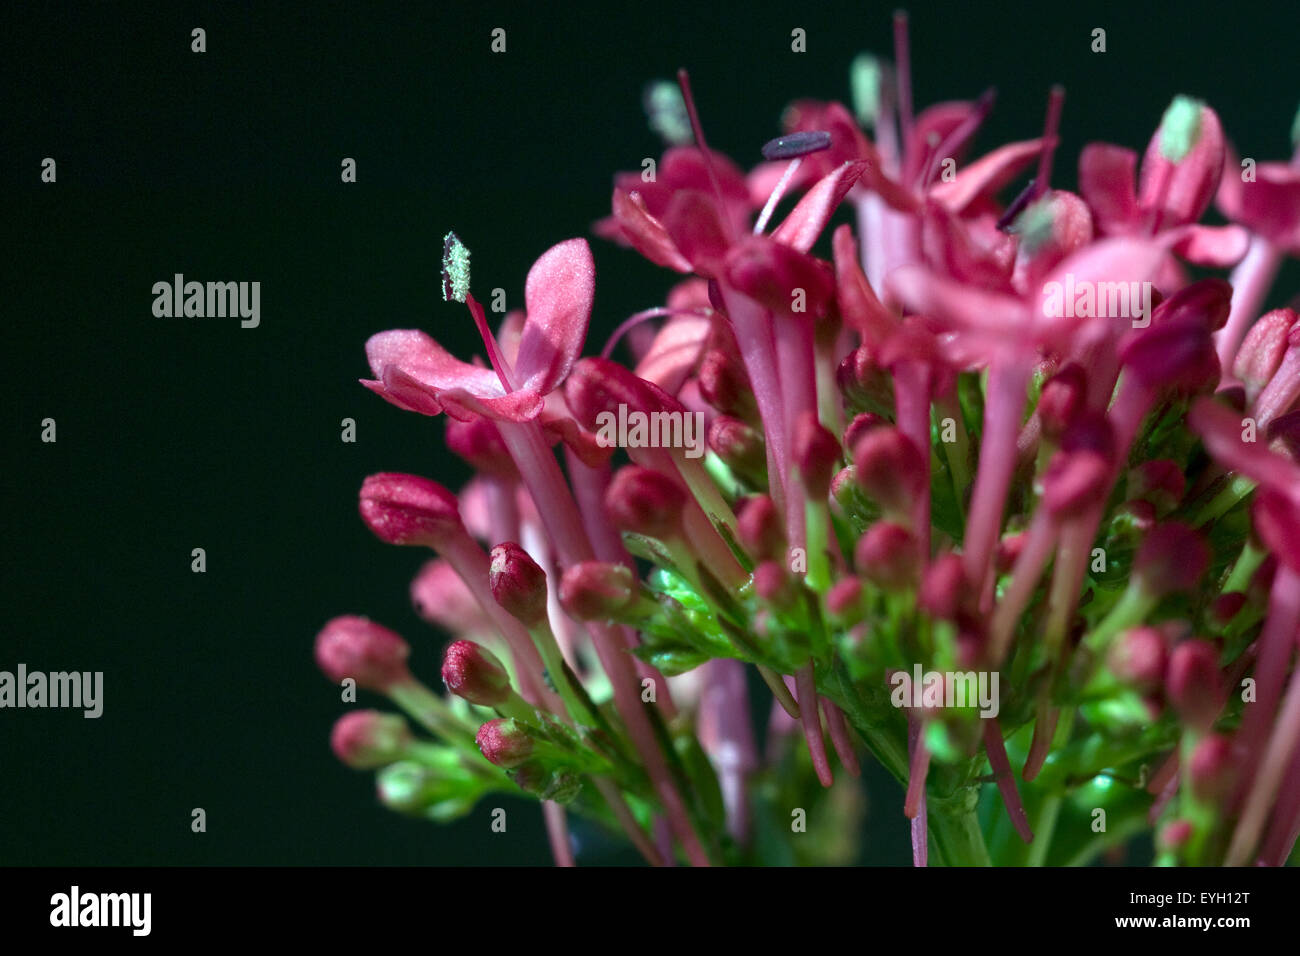 Spornblume, Centranthus, ruber, Spornblumen, - Stock Image